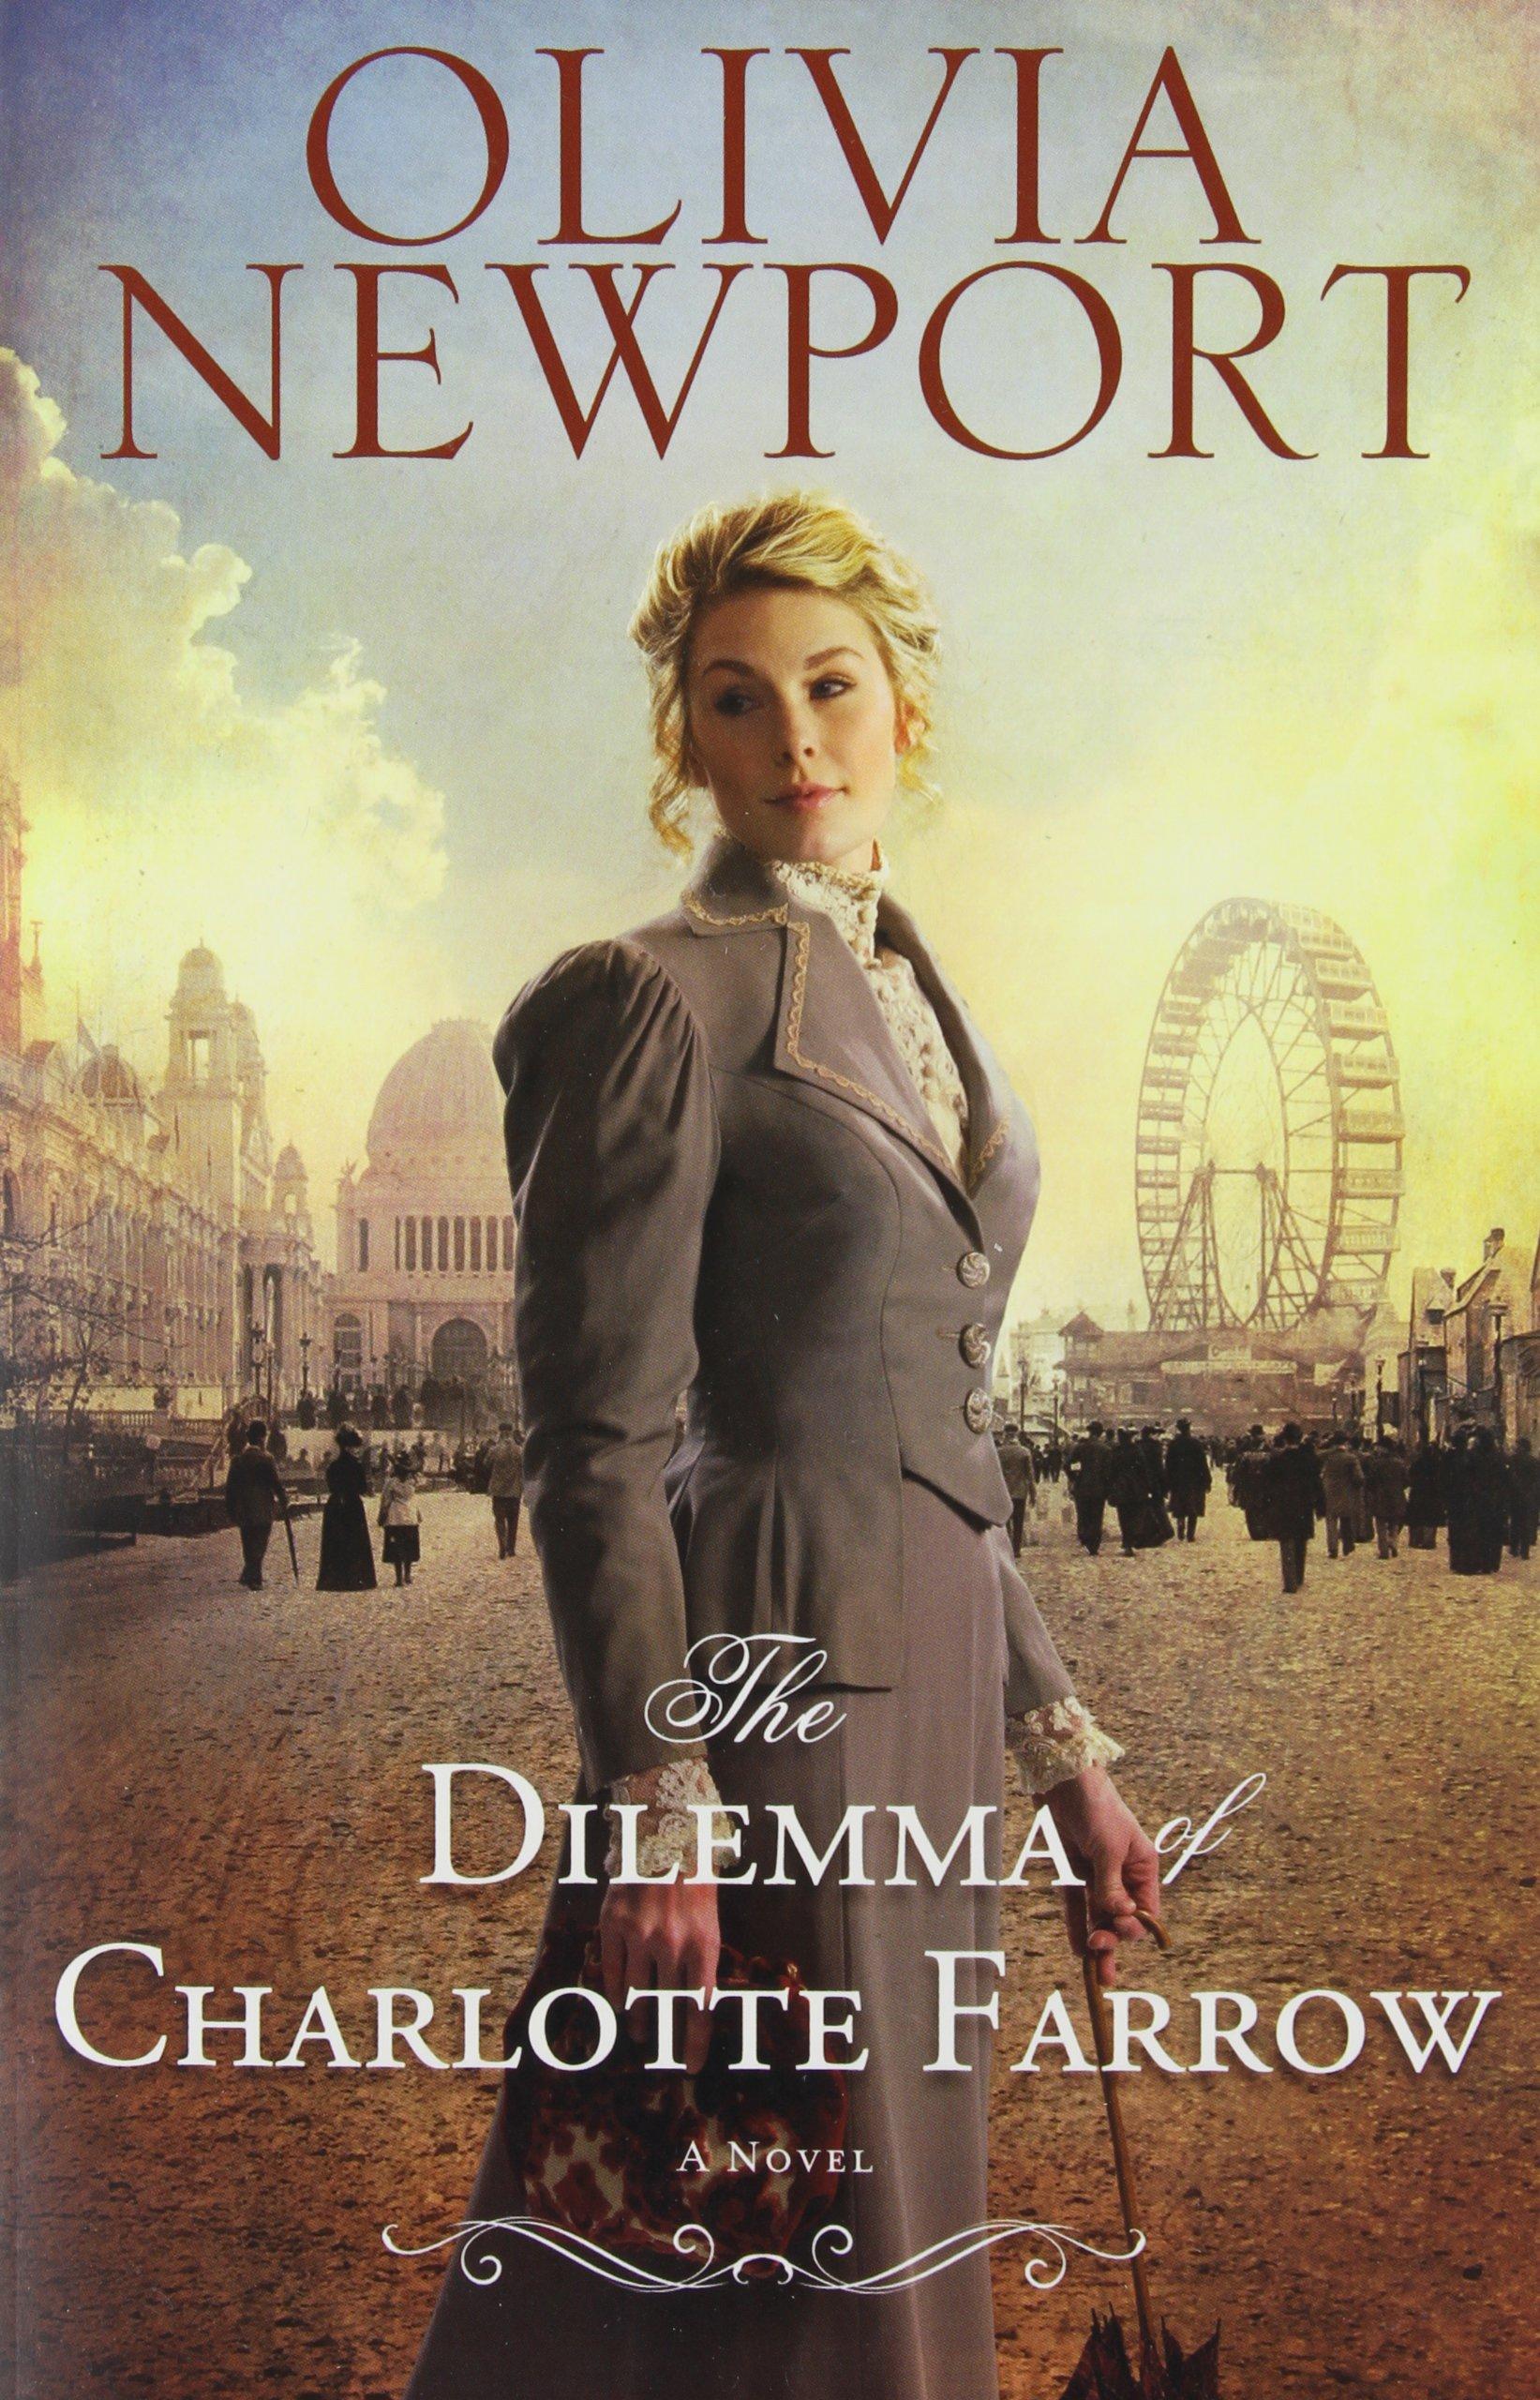 Dilemma of Charlotte Farrow, The: A Novel (Avenue of Dreams) ebook